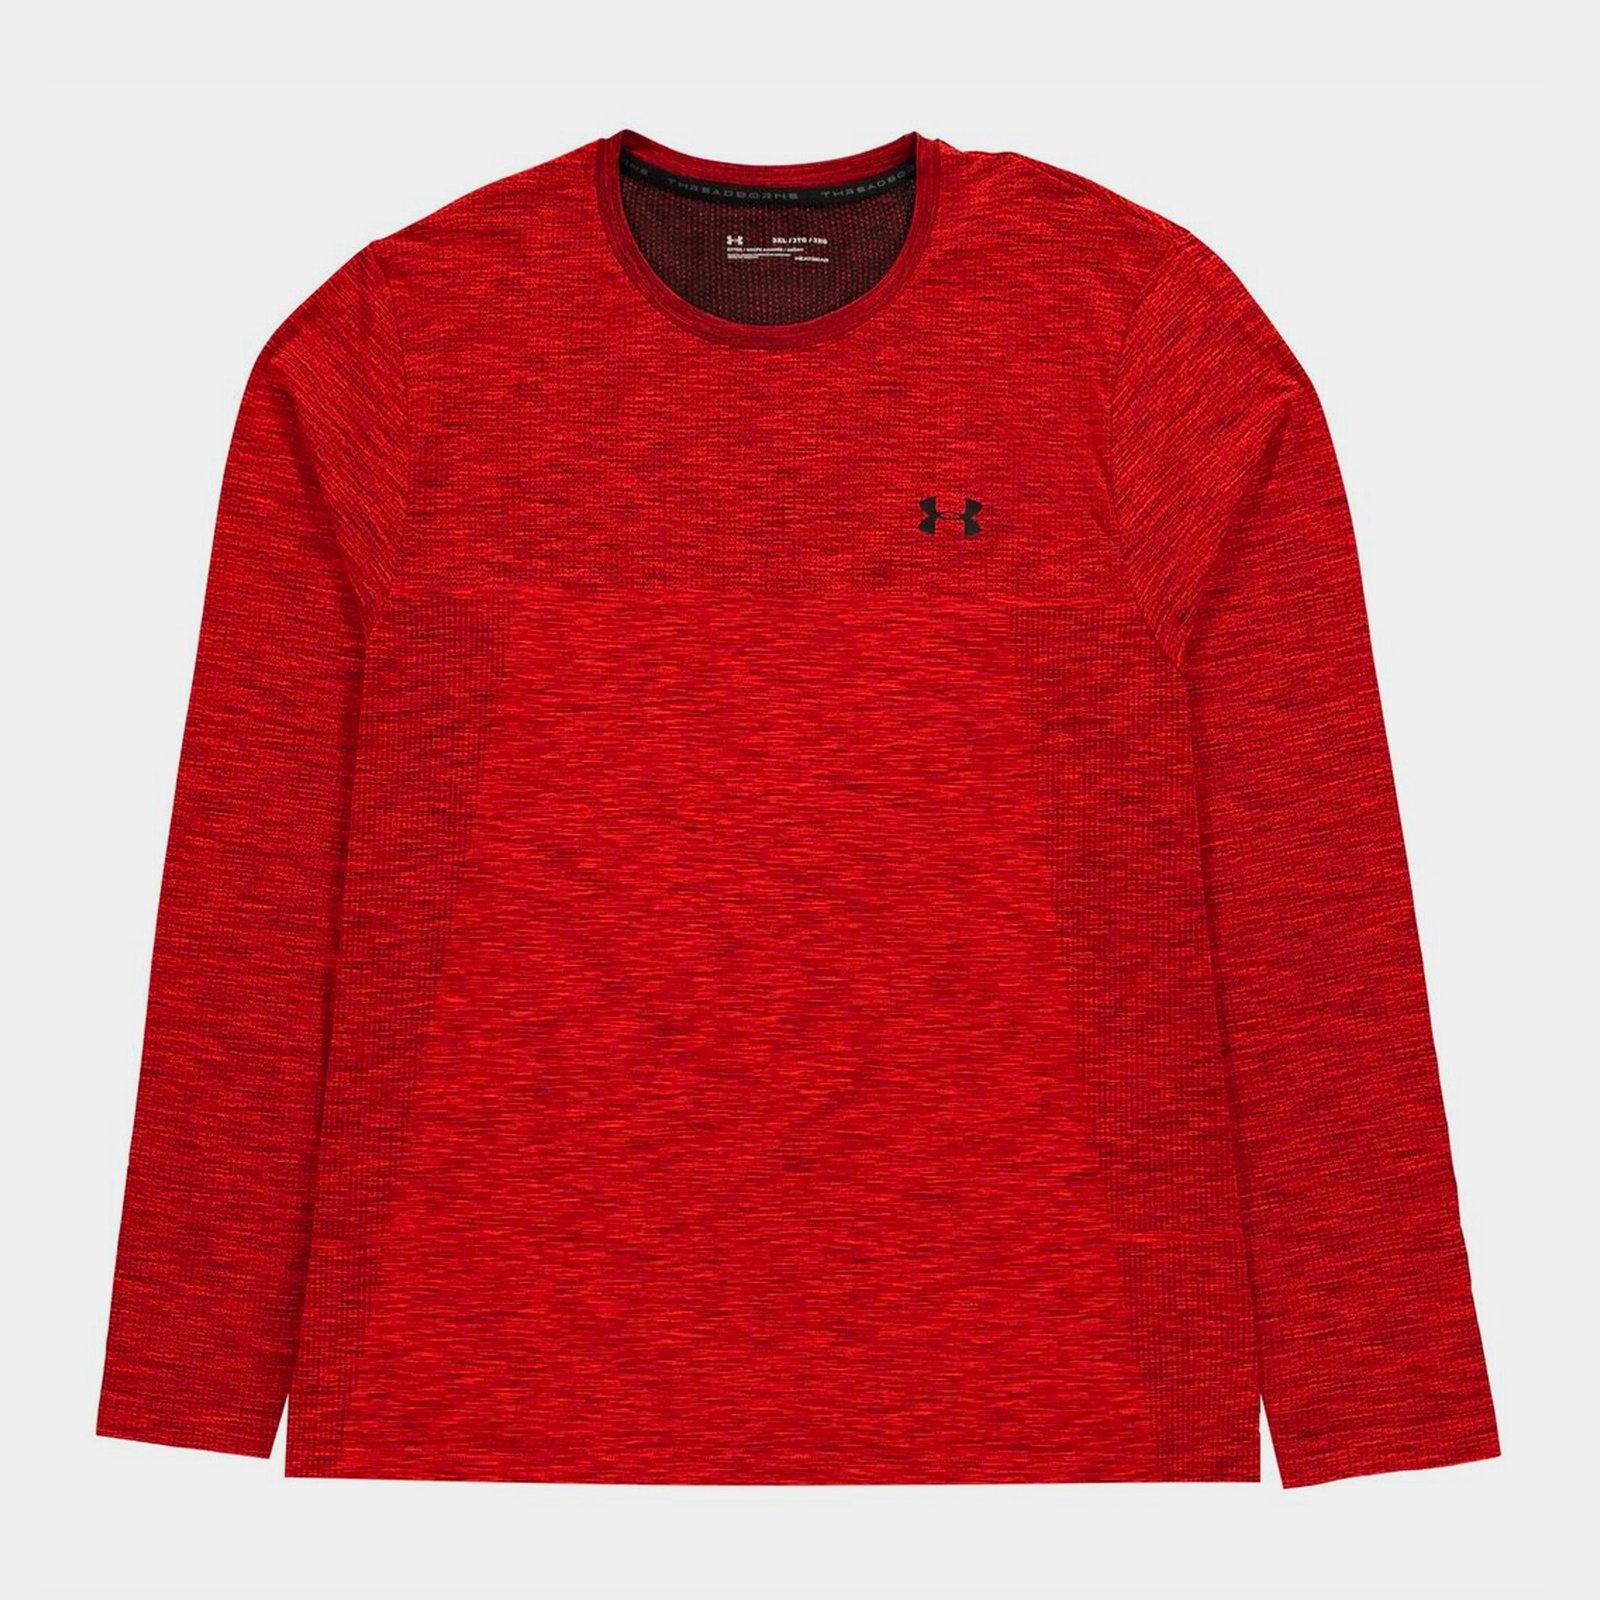 pecador Federal Rascacielos  Under Armour Mens Siphon Long Sleeve Training Top Red Sports Activewear    eBay